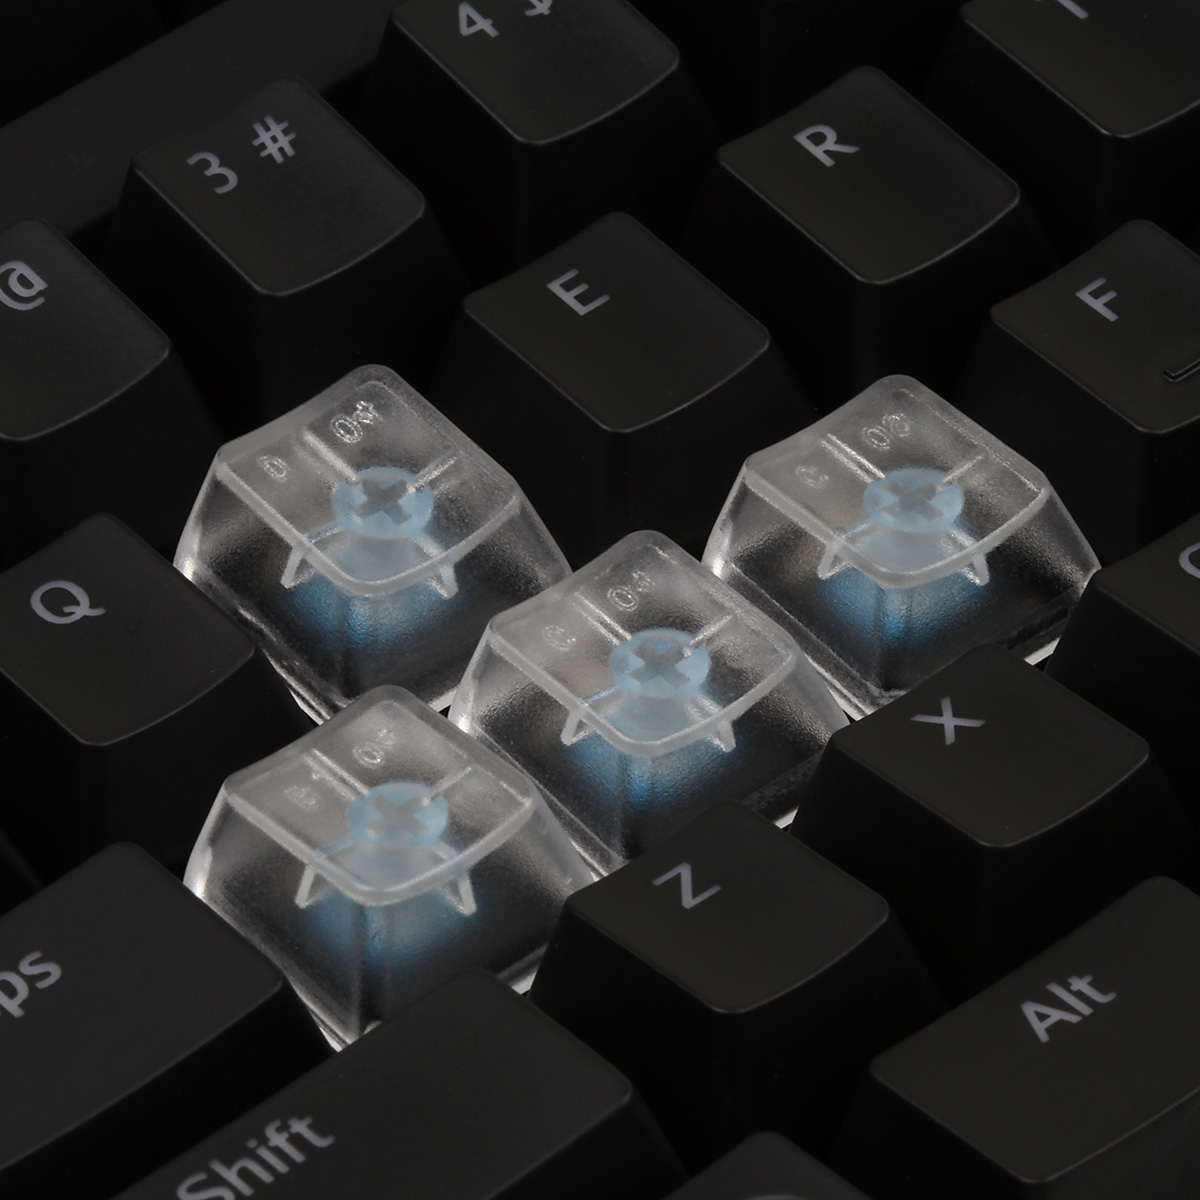 Max Keyboard Clear Translucent Cherry Mx Blank Keycap Set